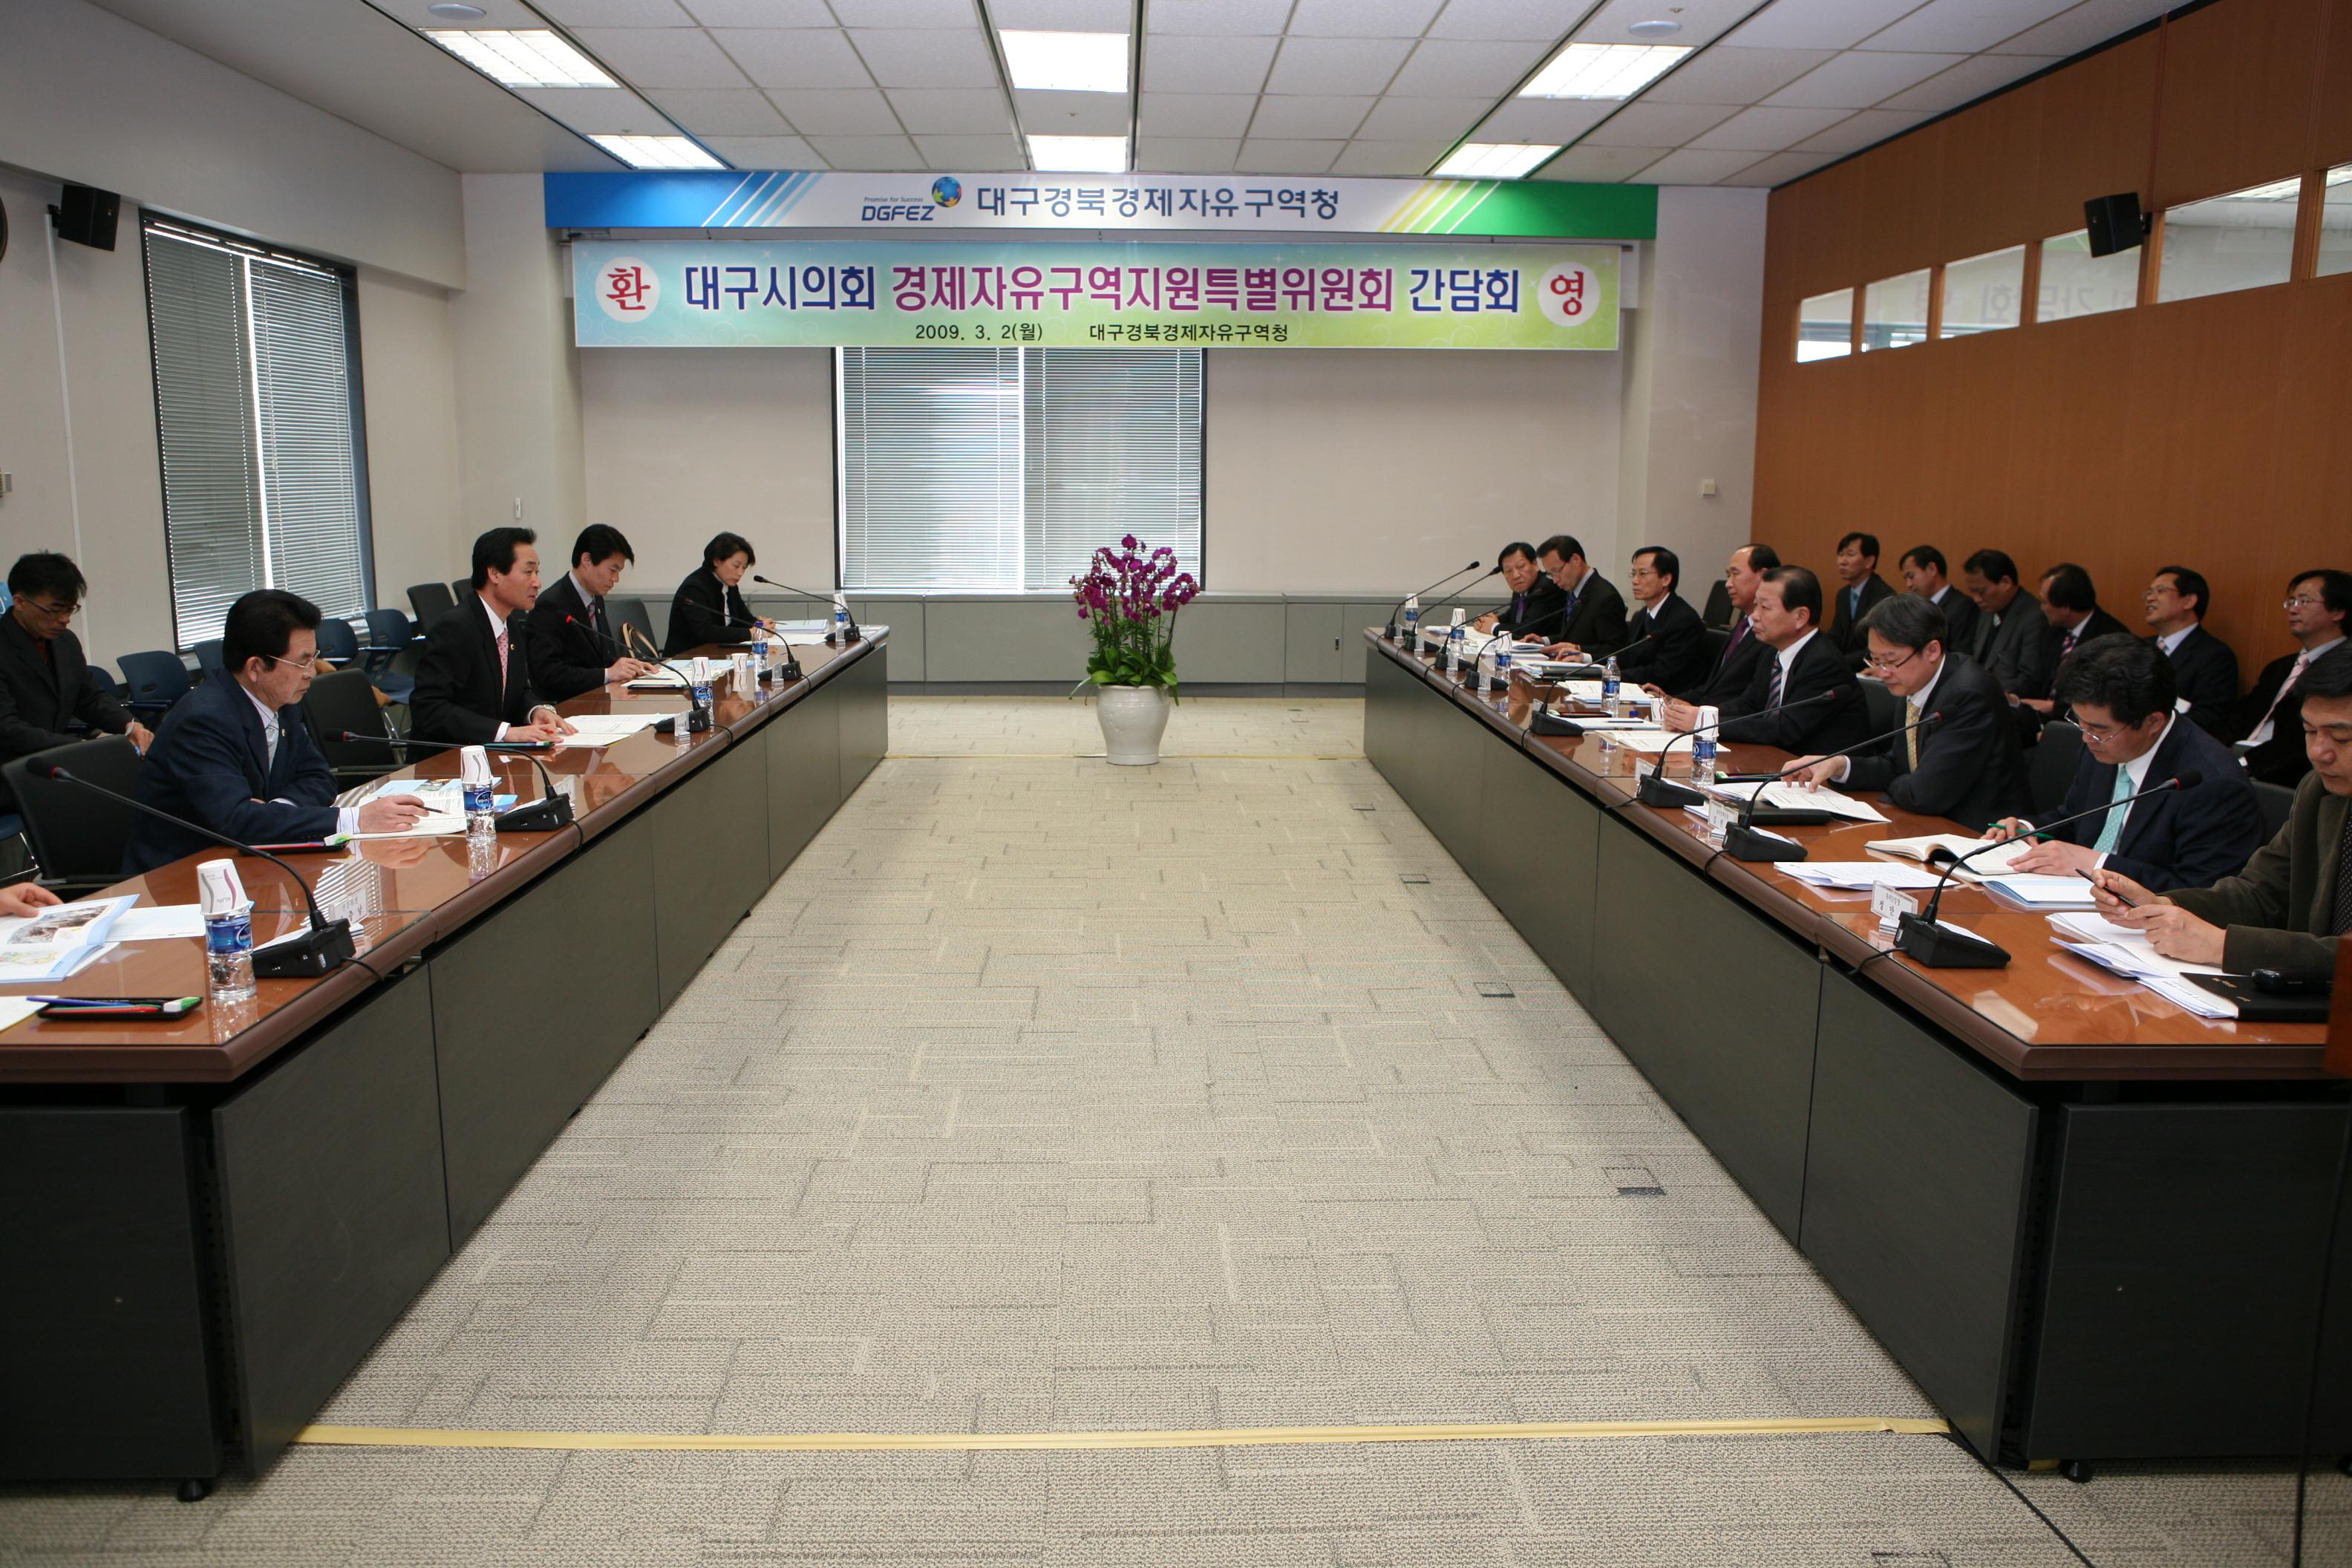 Visit from Daegu City Council